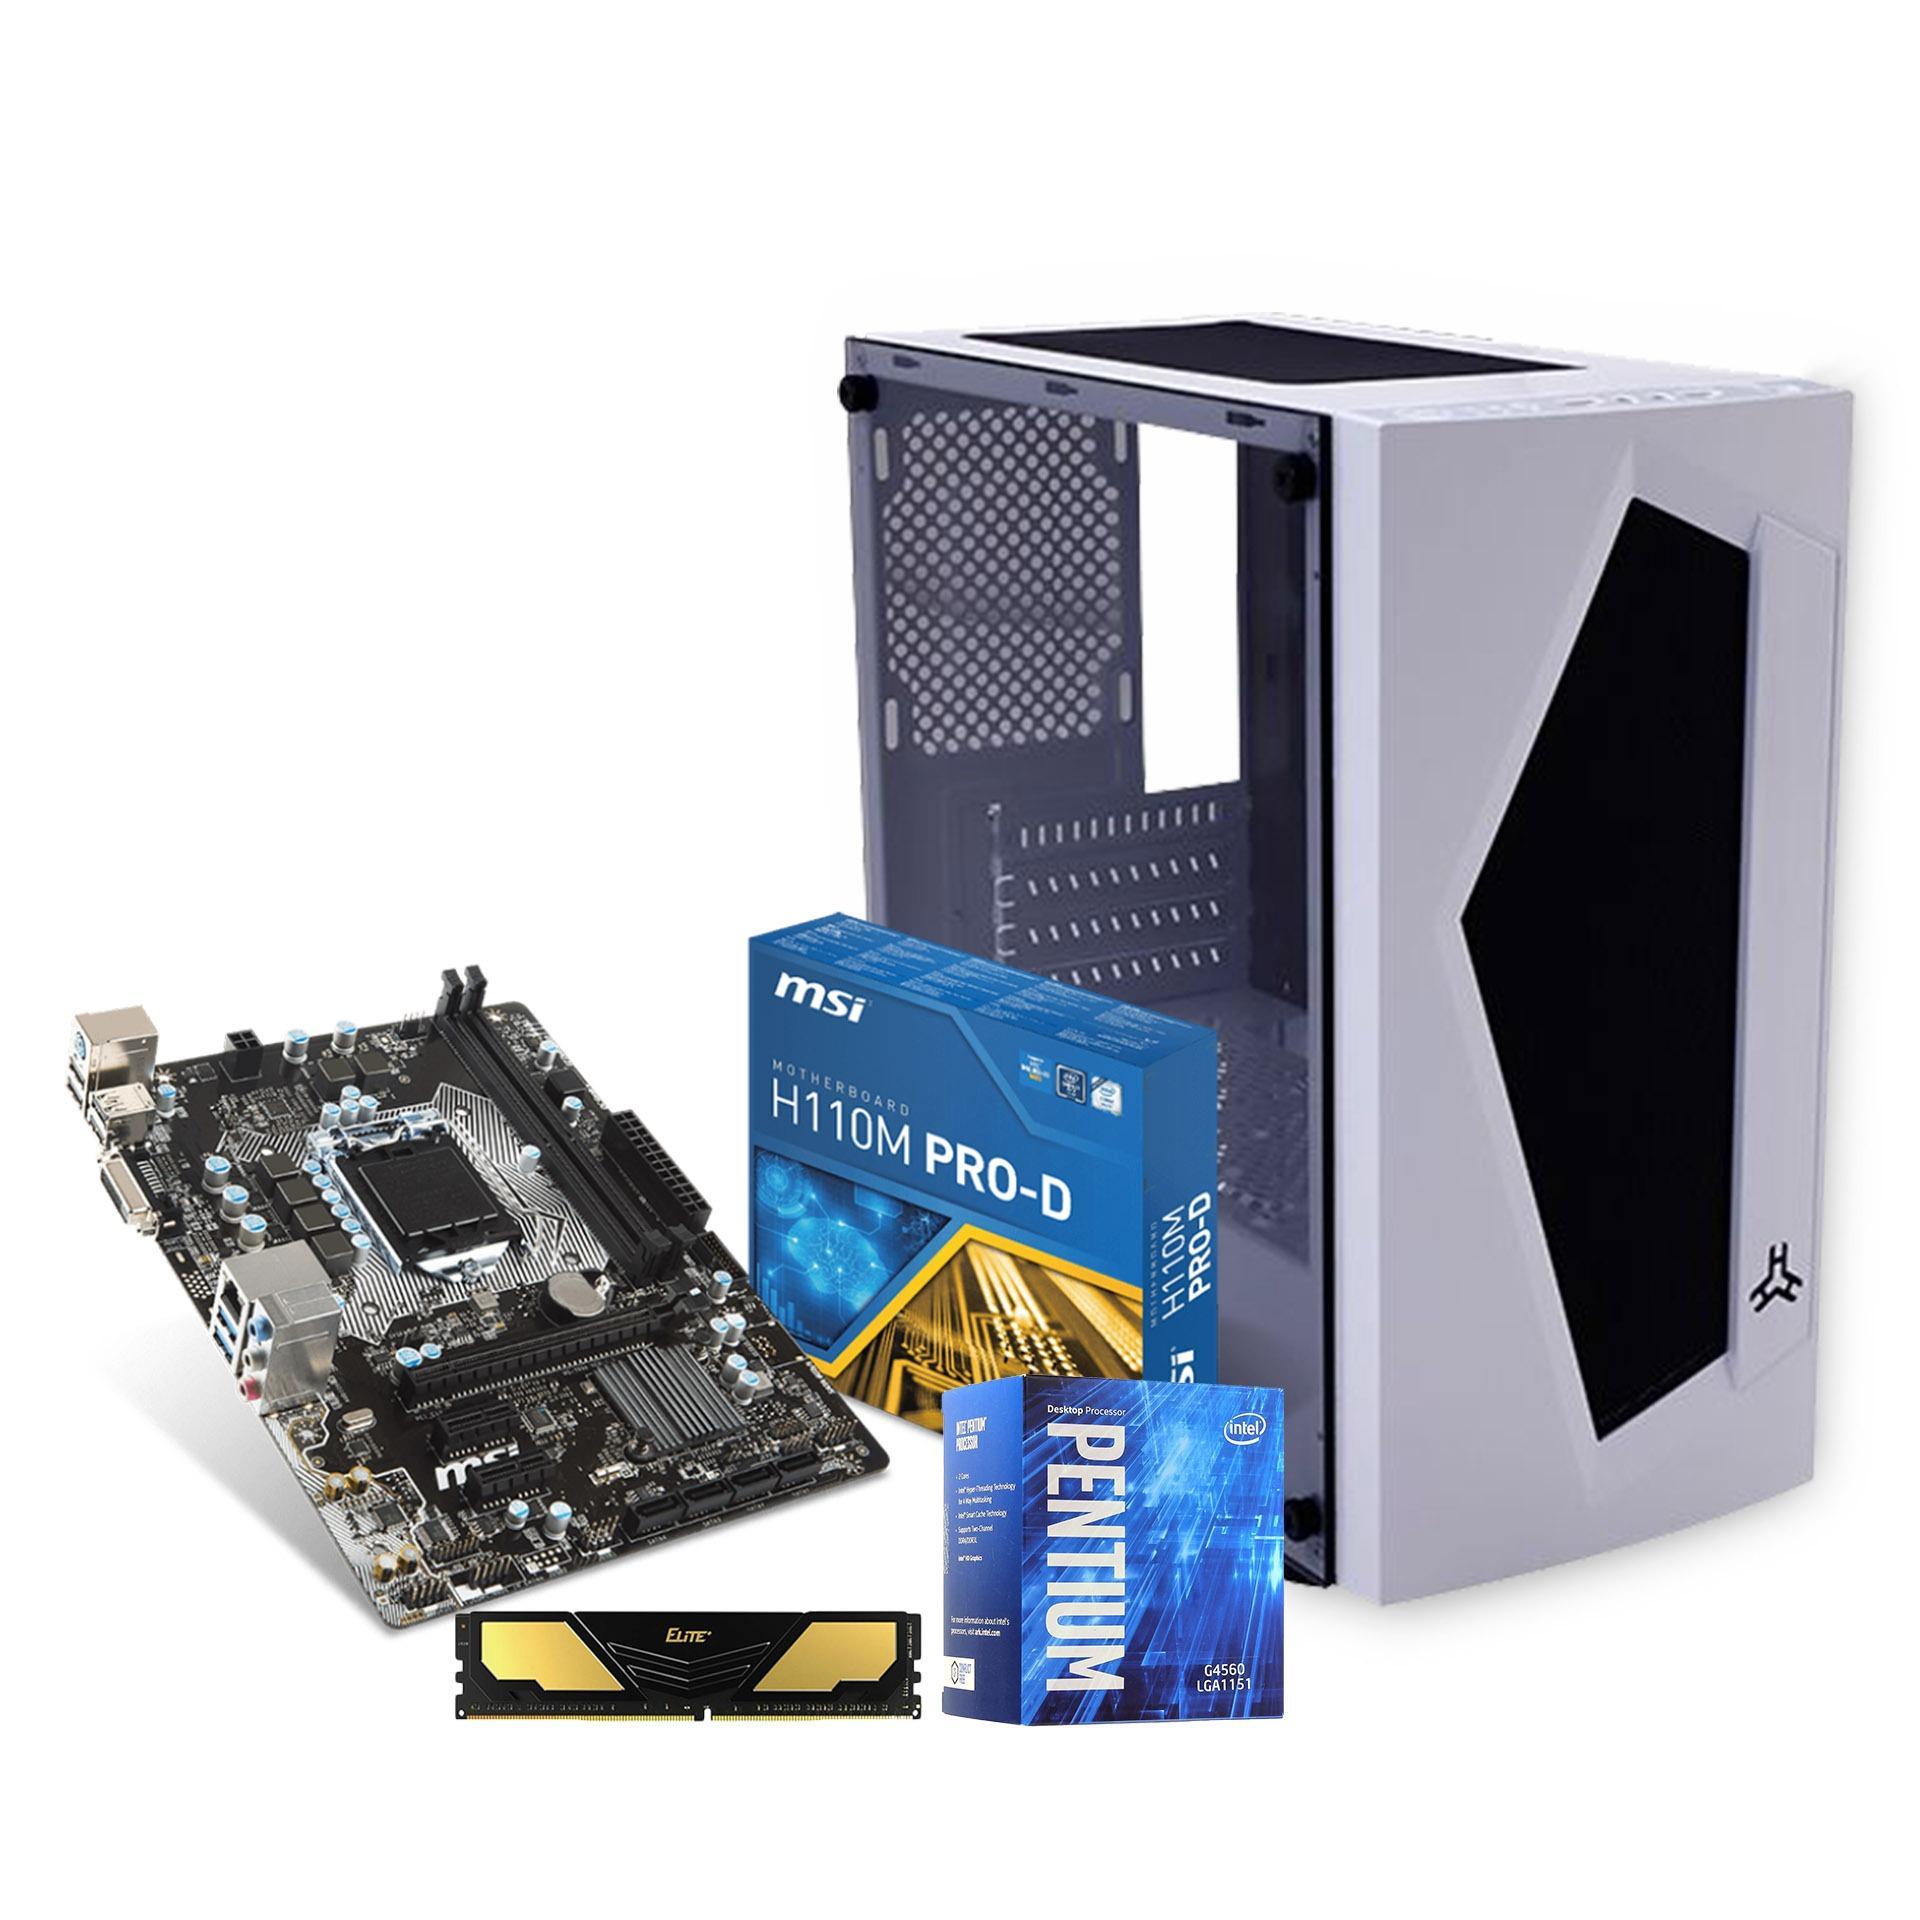 Tech Essentials G4560 Gaming Diskless Bundle Philippines Intel Pentium G4600 36ghz Kabylake Socket 1151